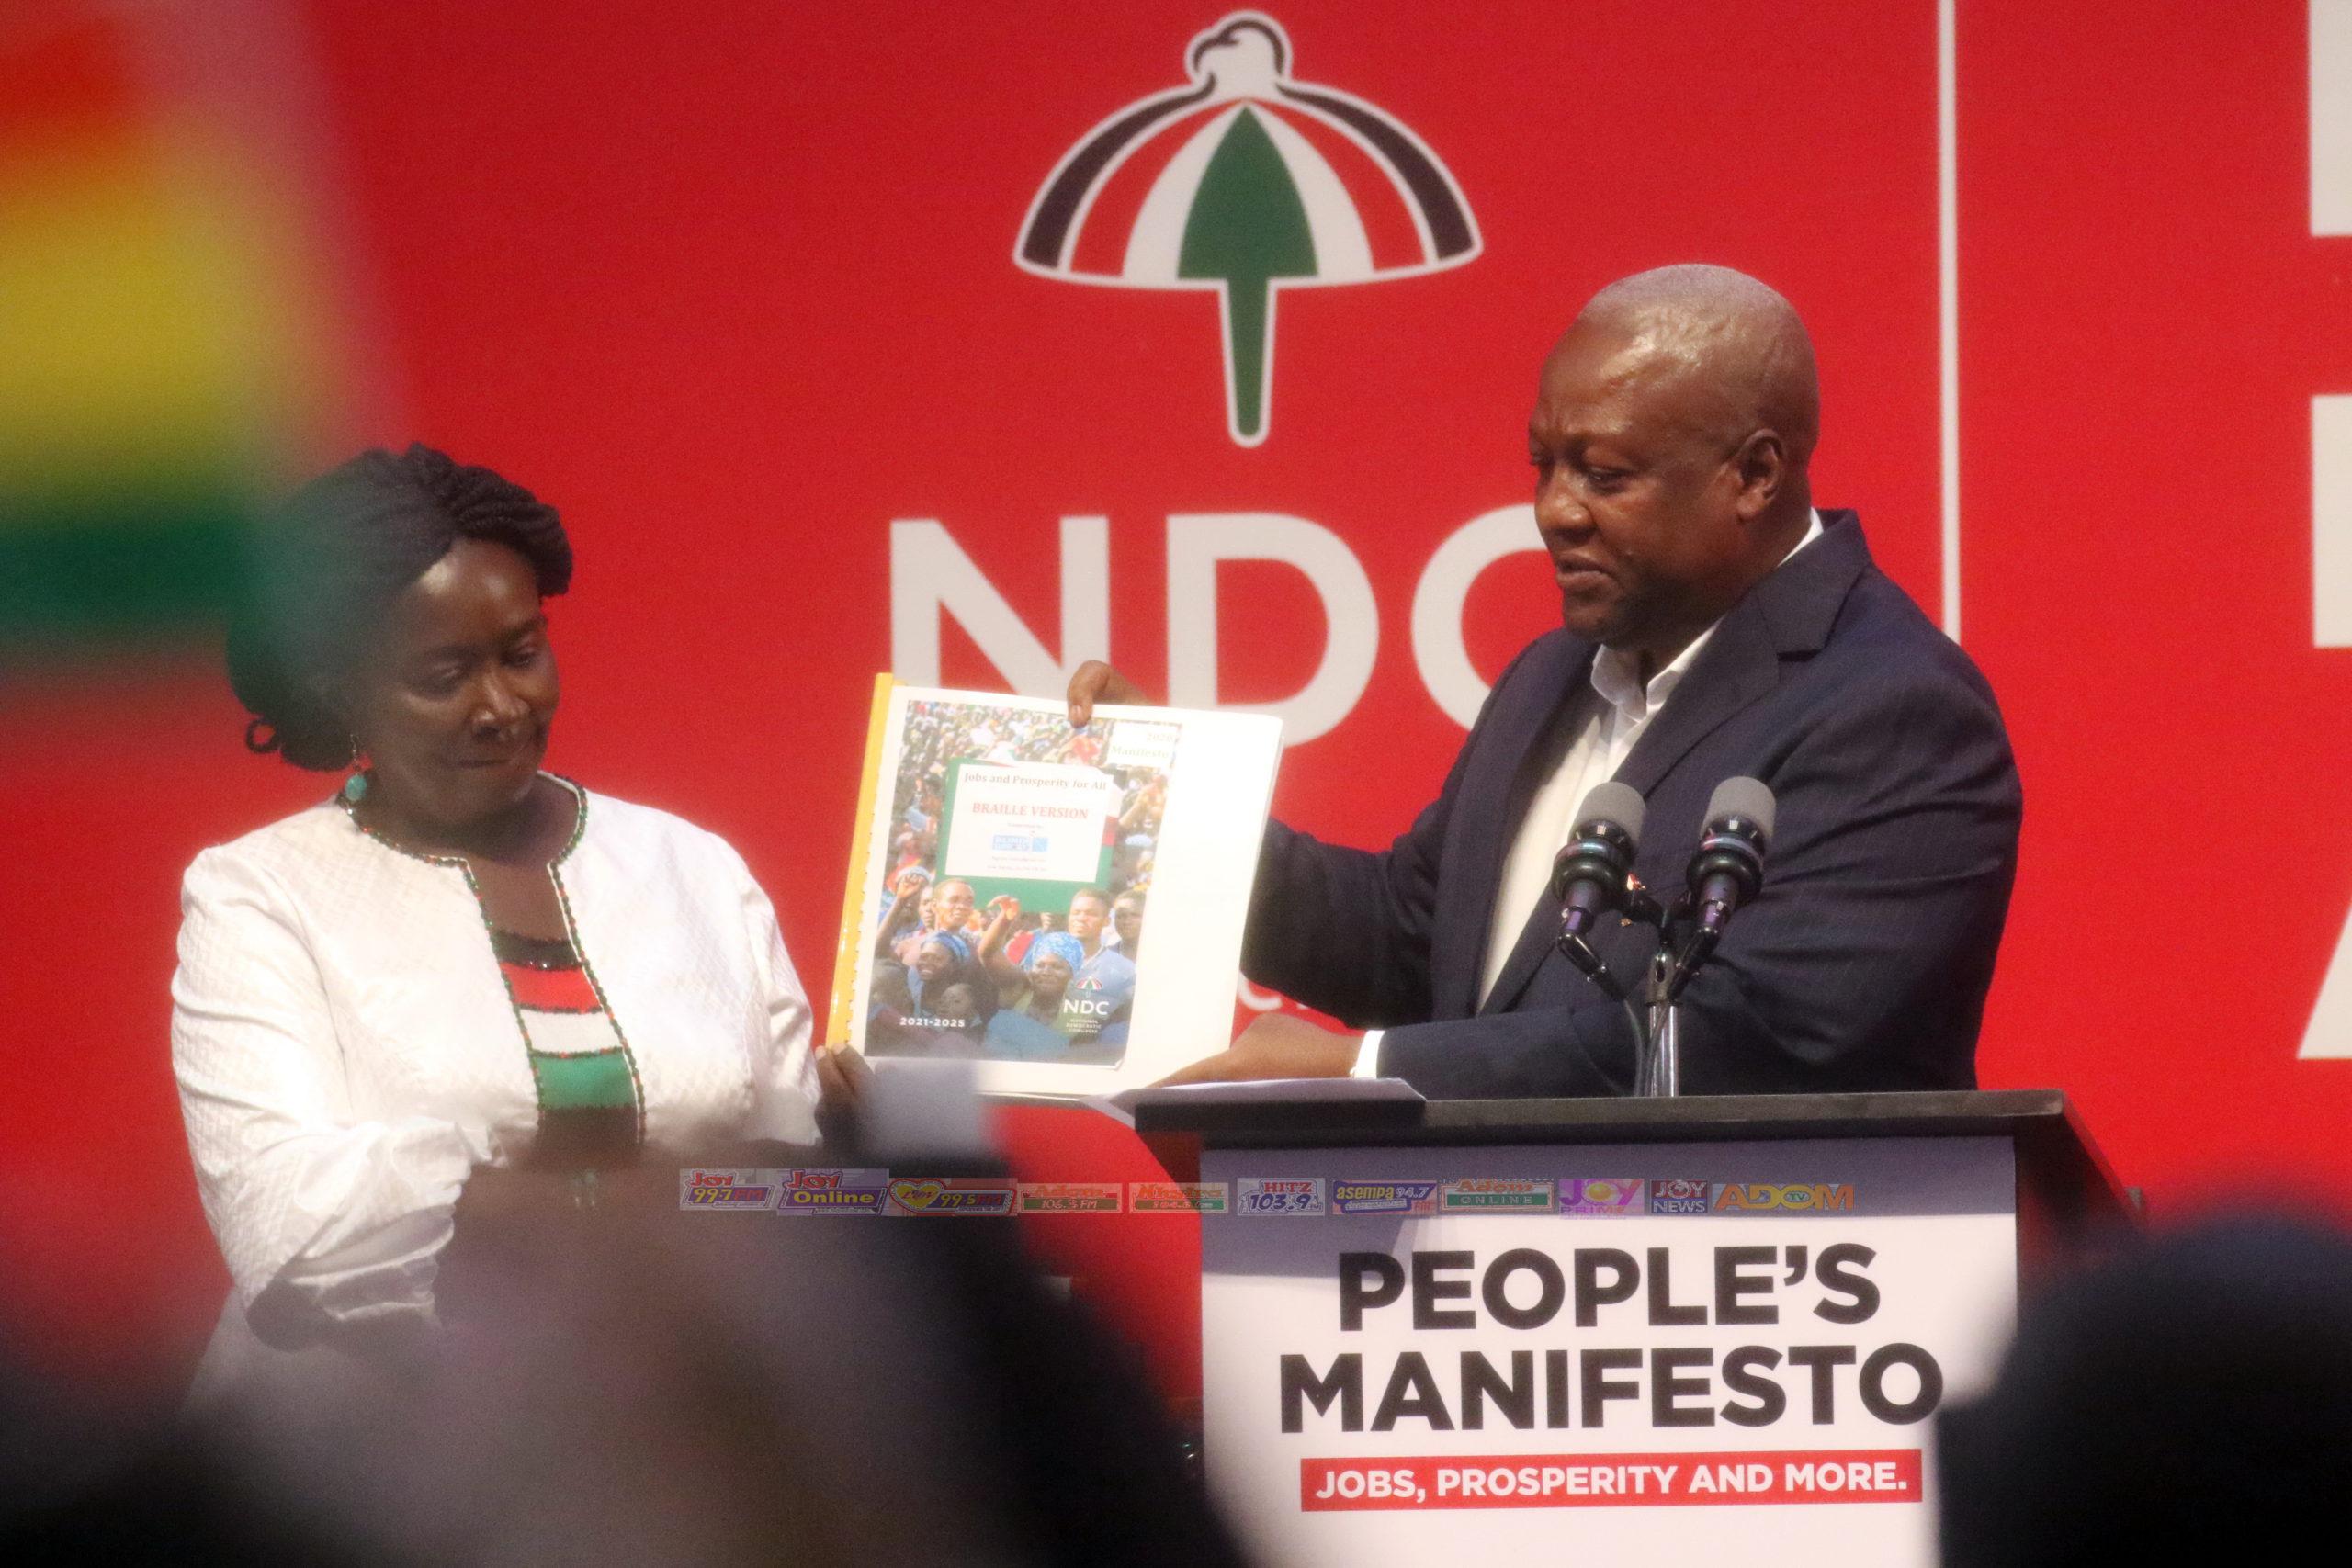 NDC manifesto launch - Adomonline.com